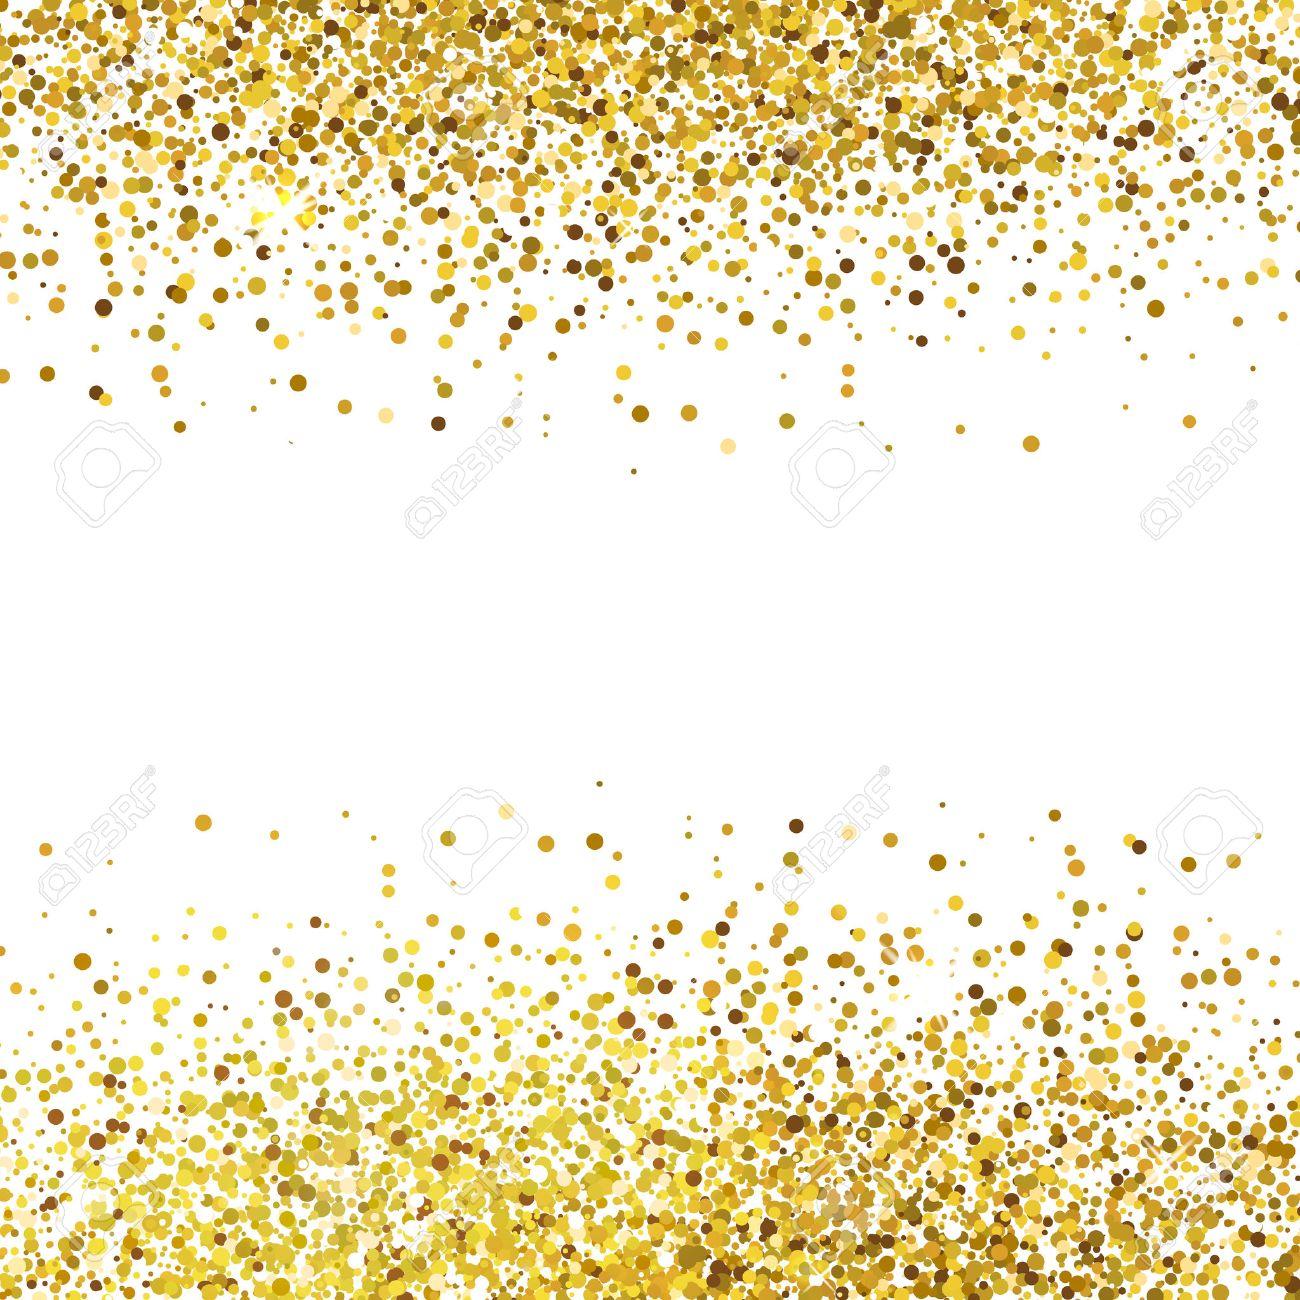 Shiny golden glitter on white background - 50743682